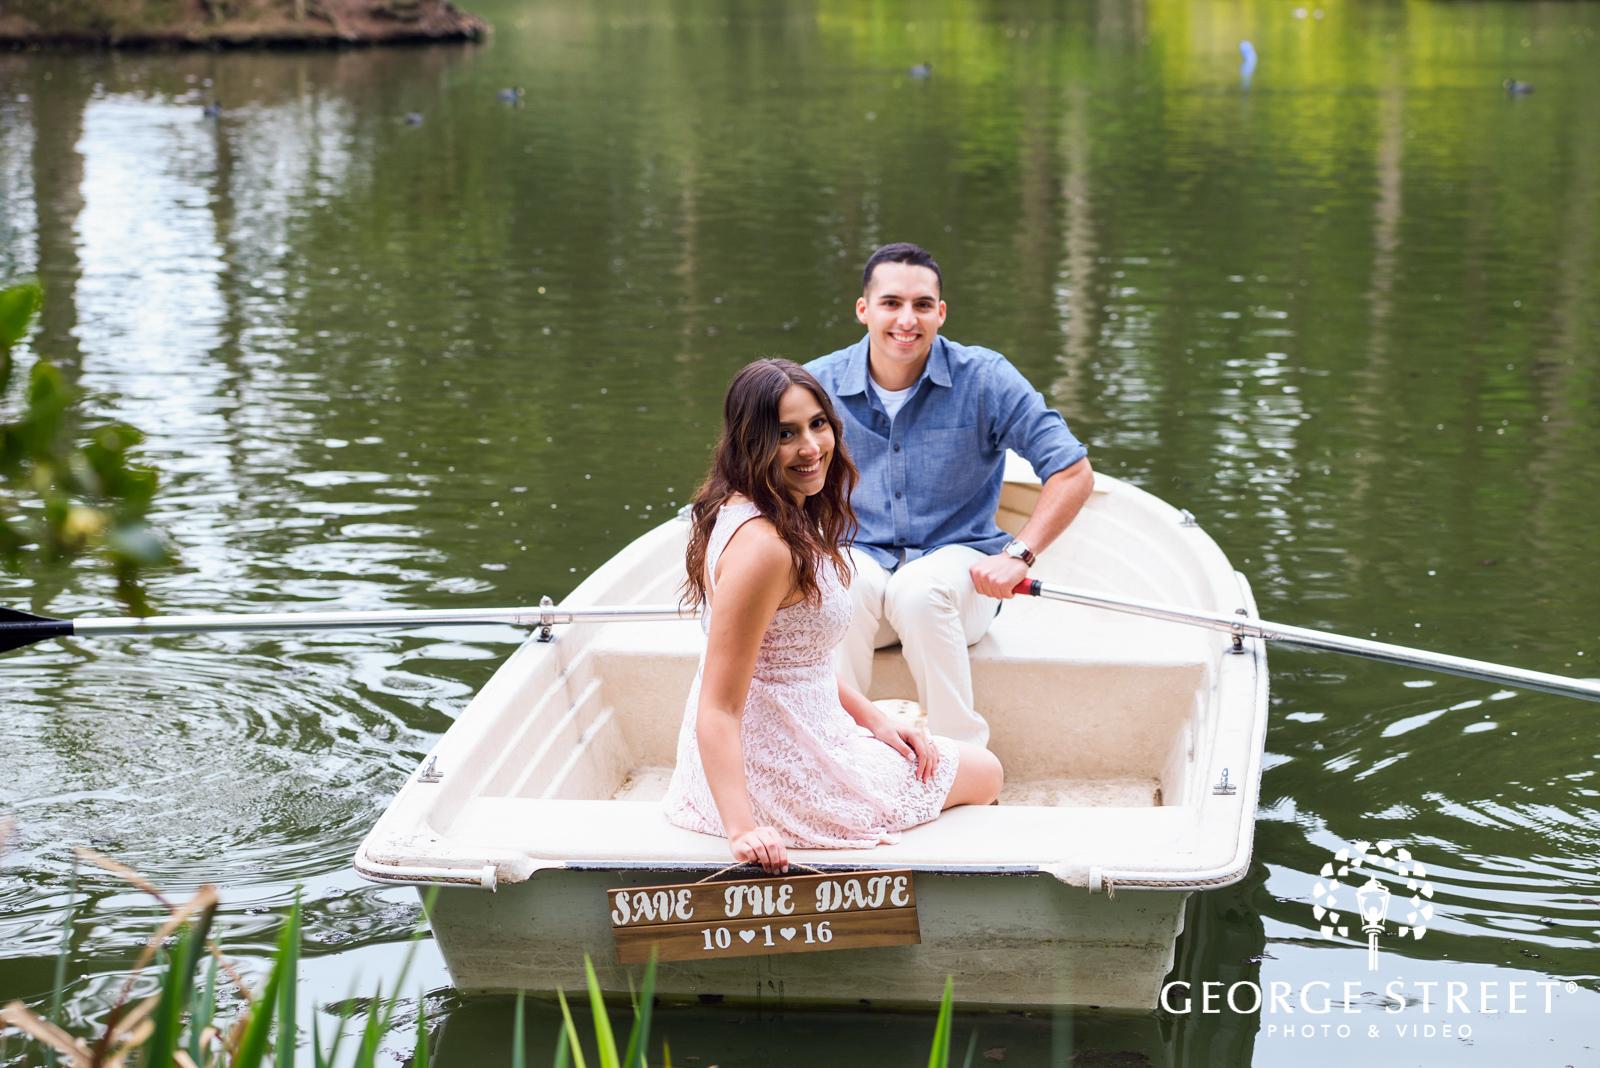 gorgeous outdoor engagement portrait at golden gate state park 5